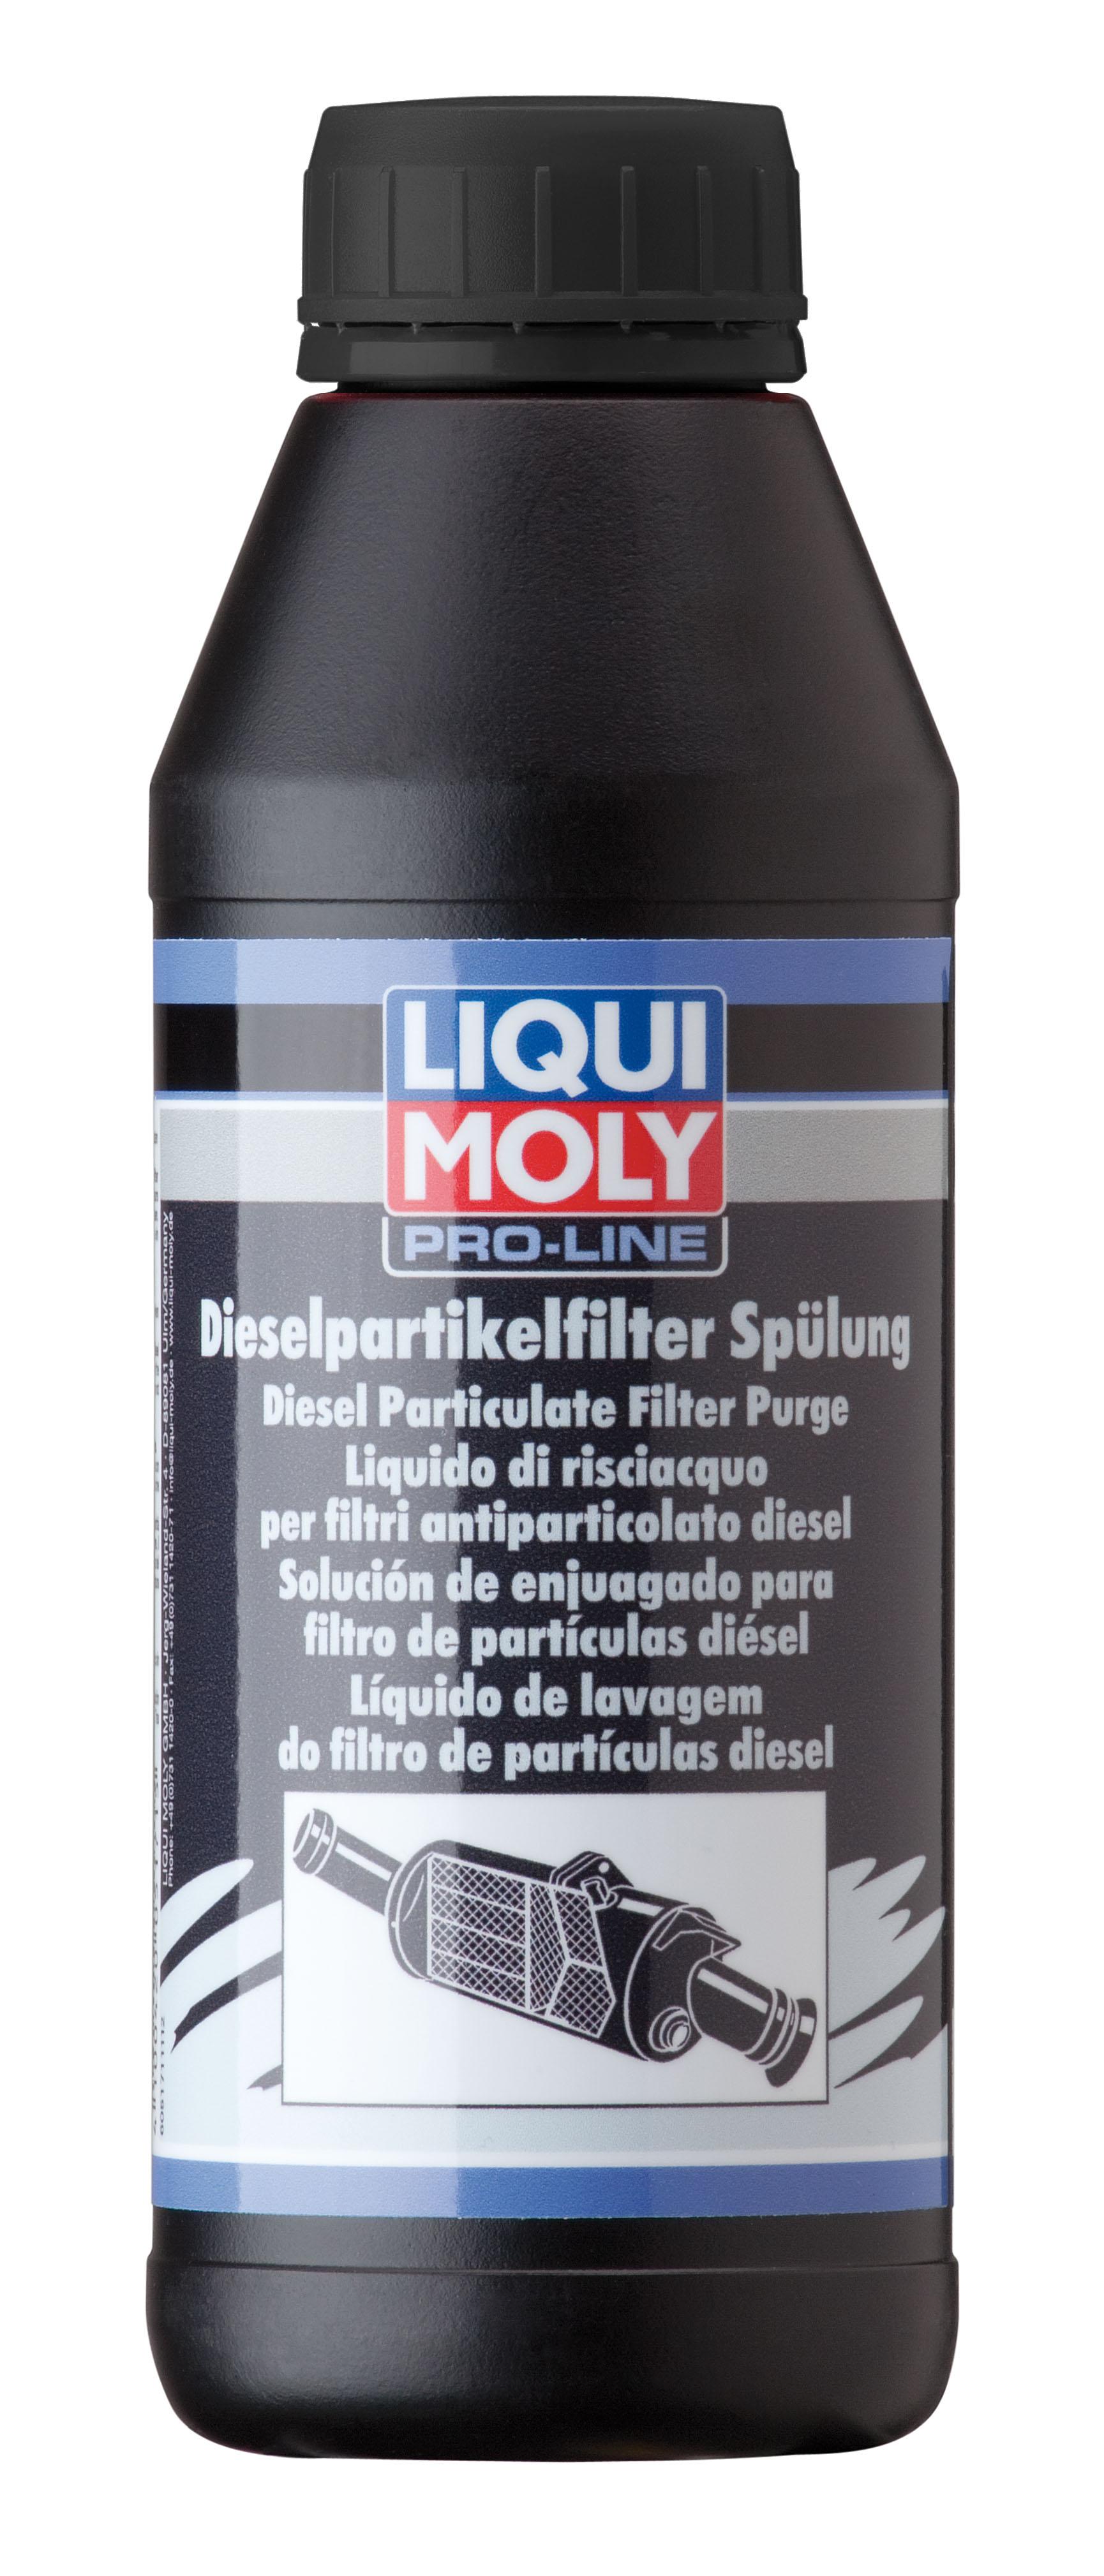 "LM נוזל שטיפה למע כת 500 DPF מ""ל ליקווי מולי"